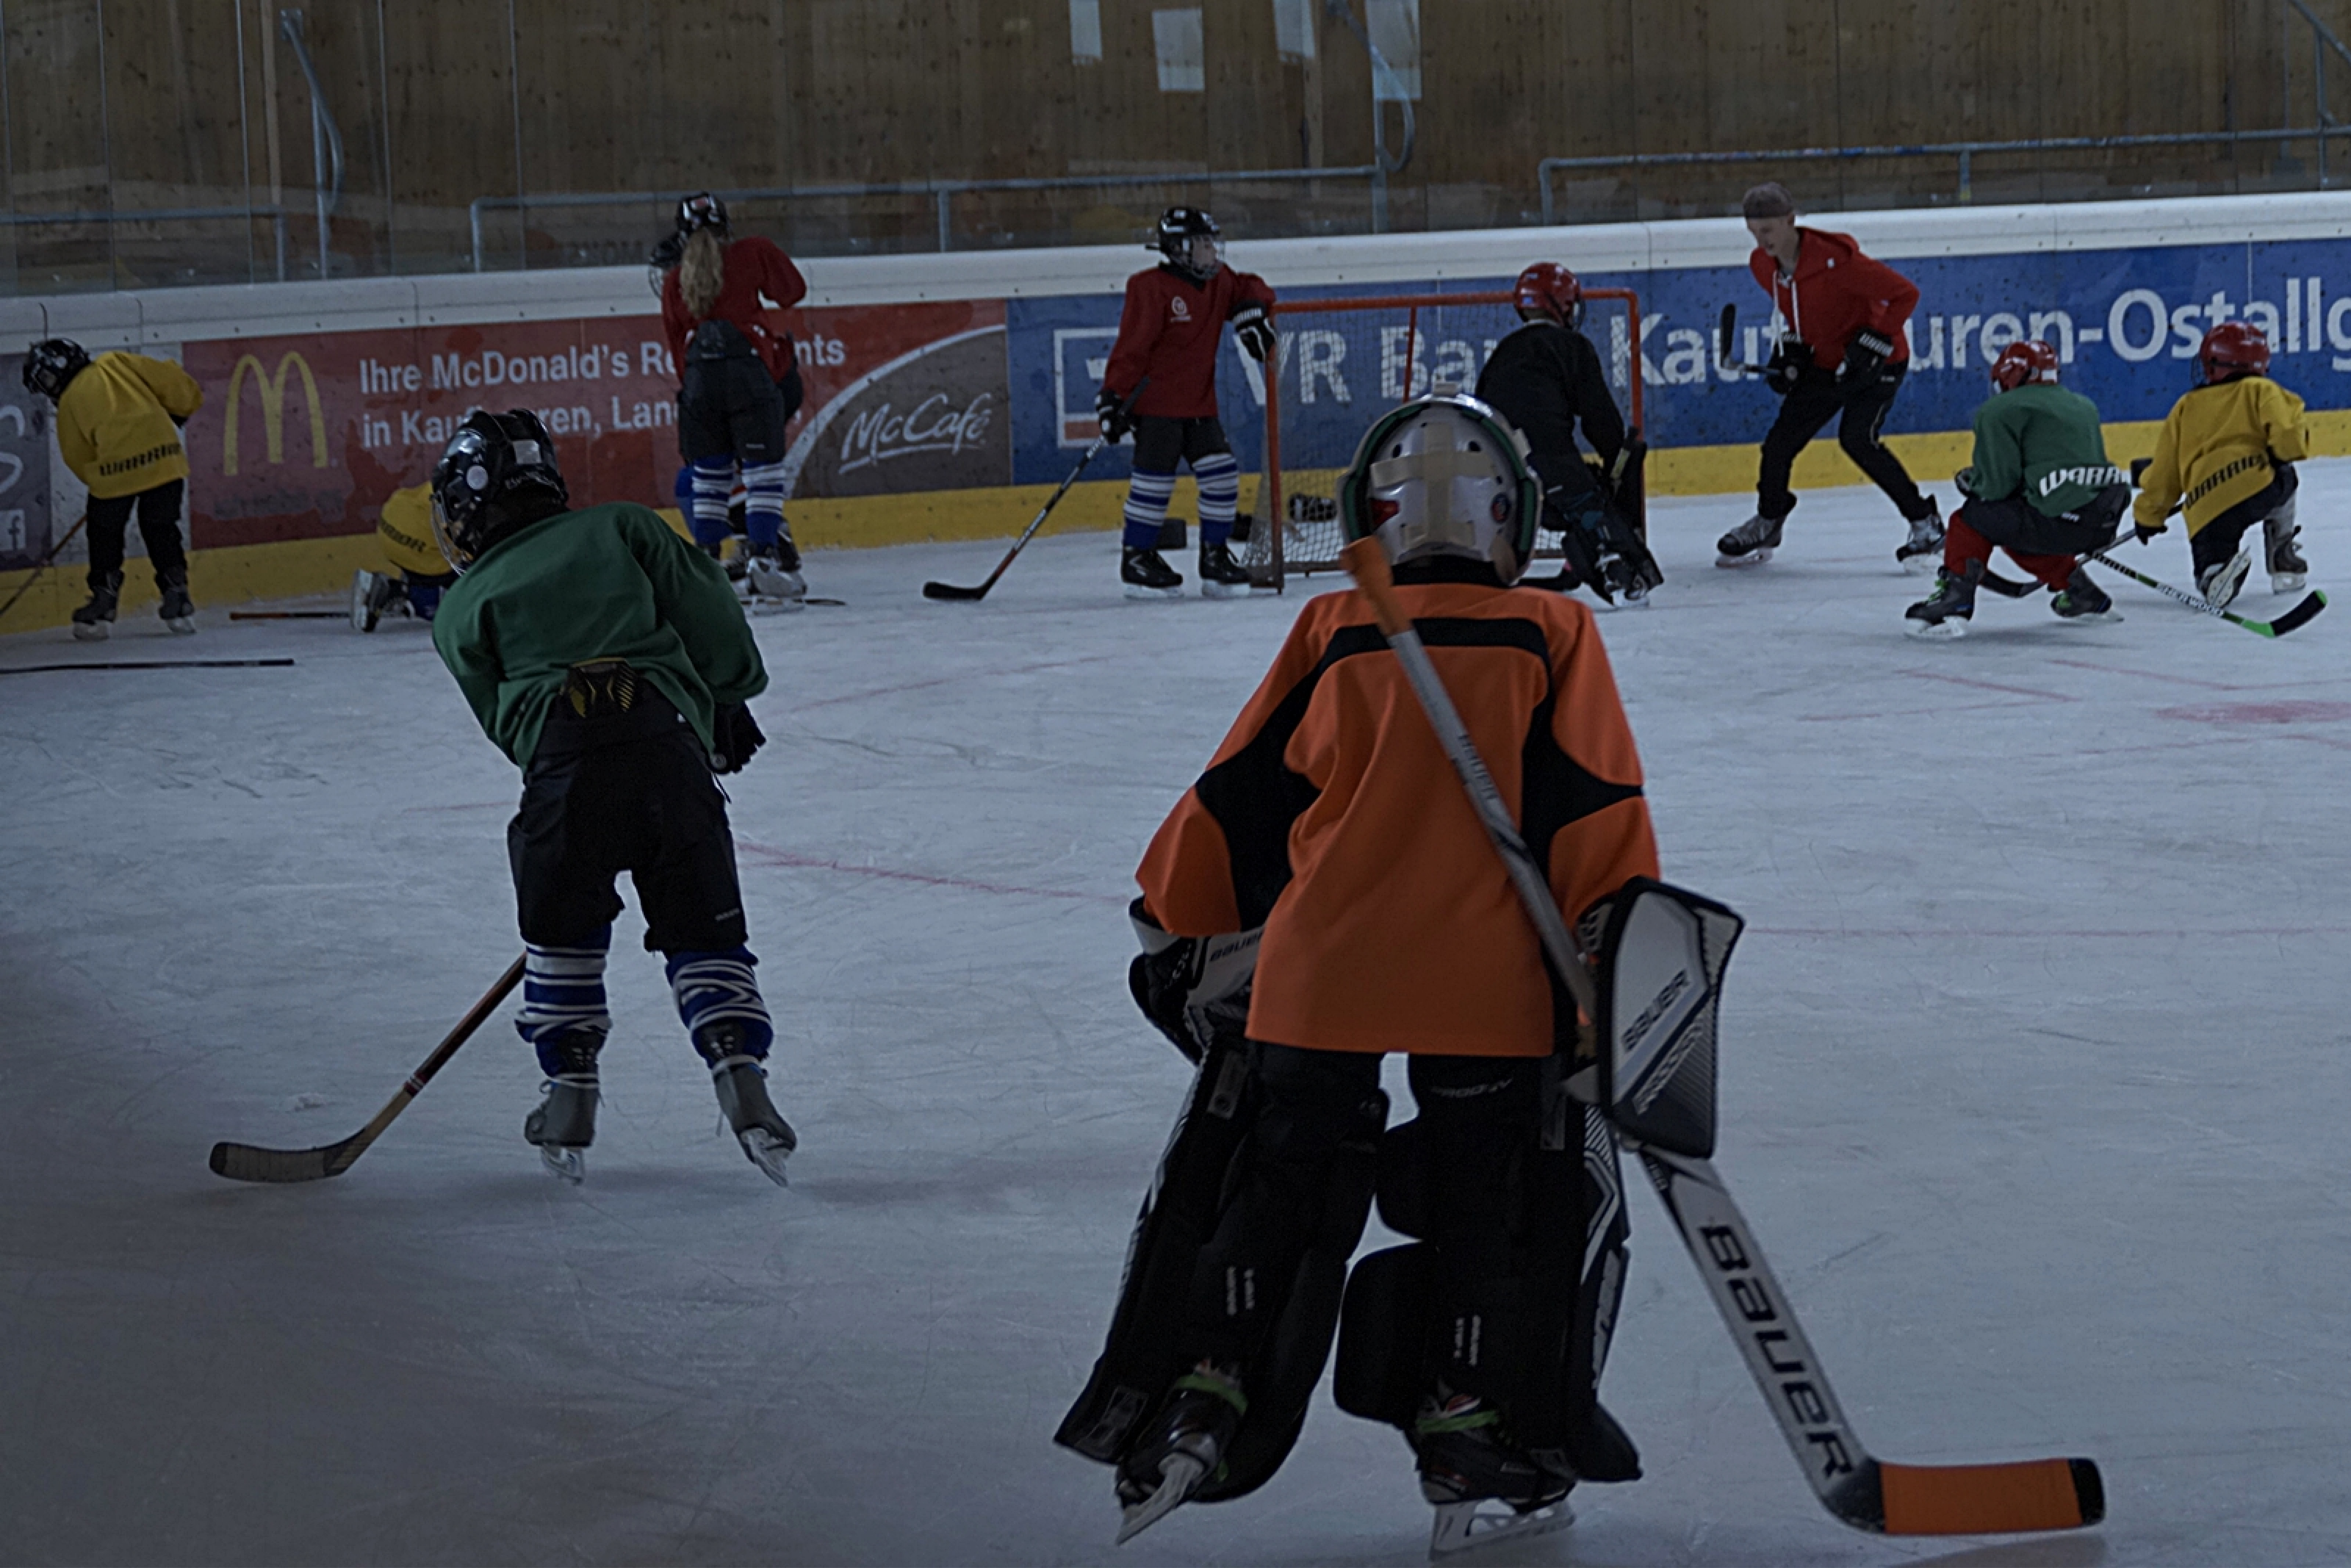 Kids on Ice Day 15.09 (6)